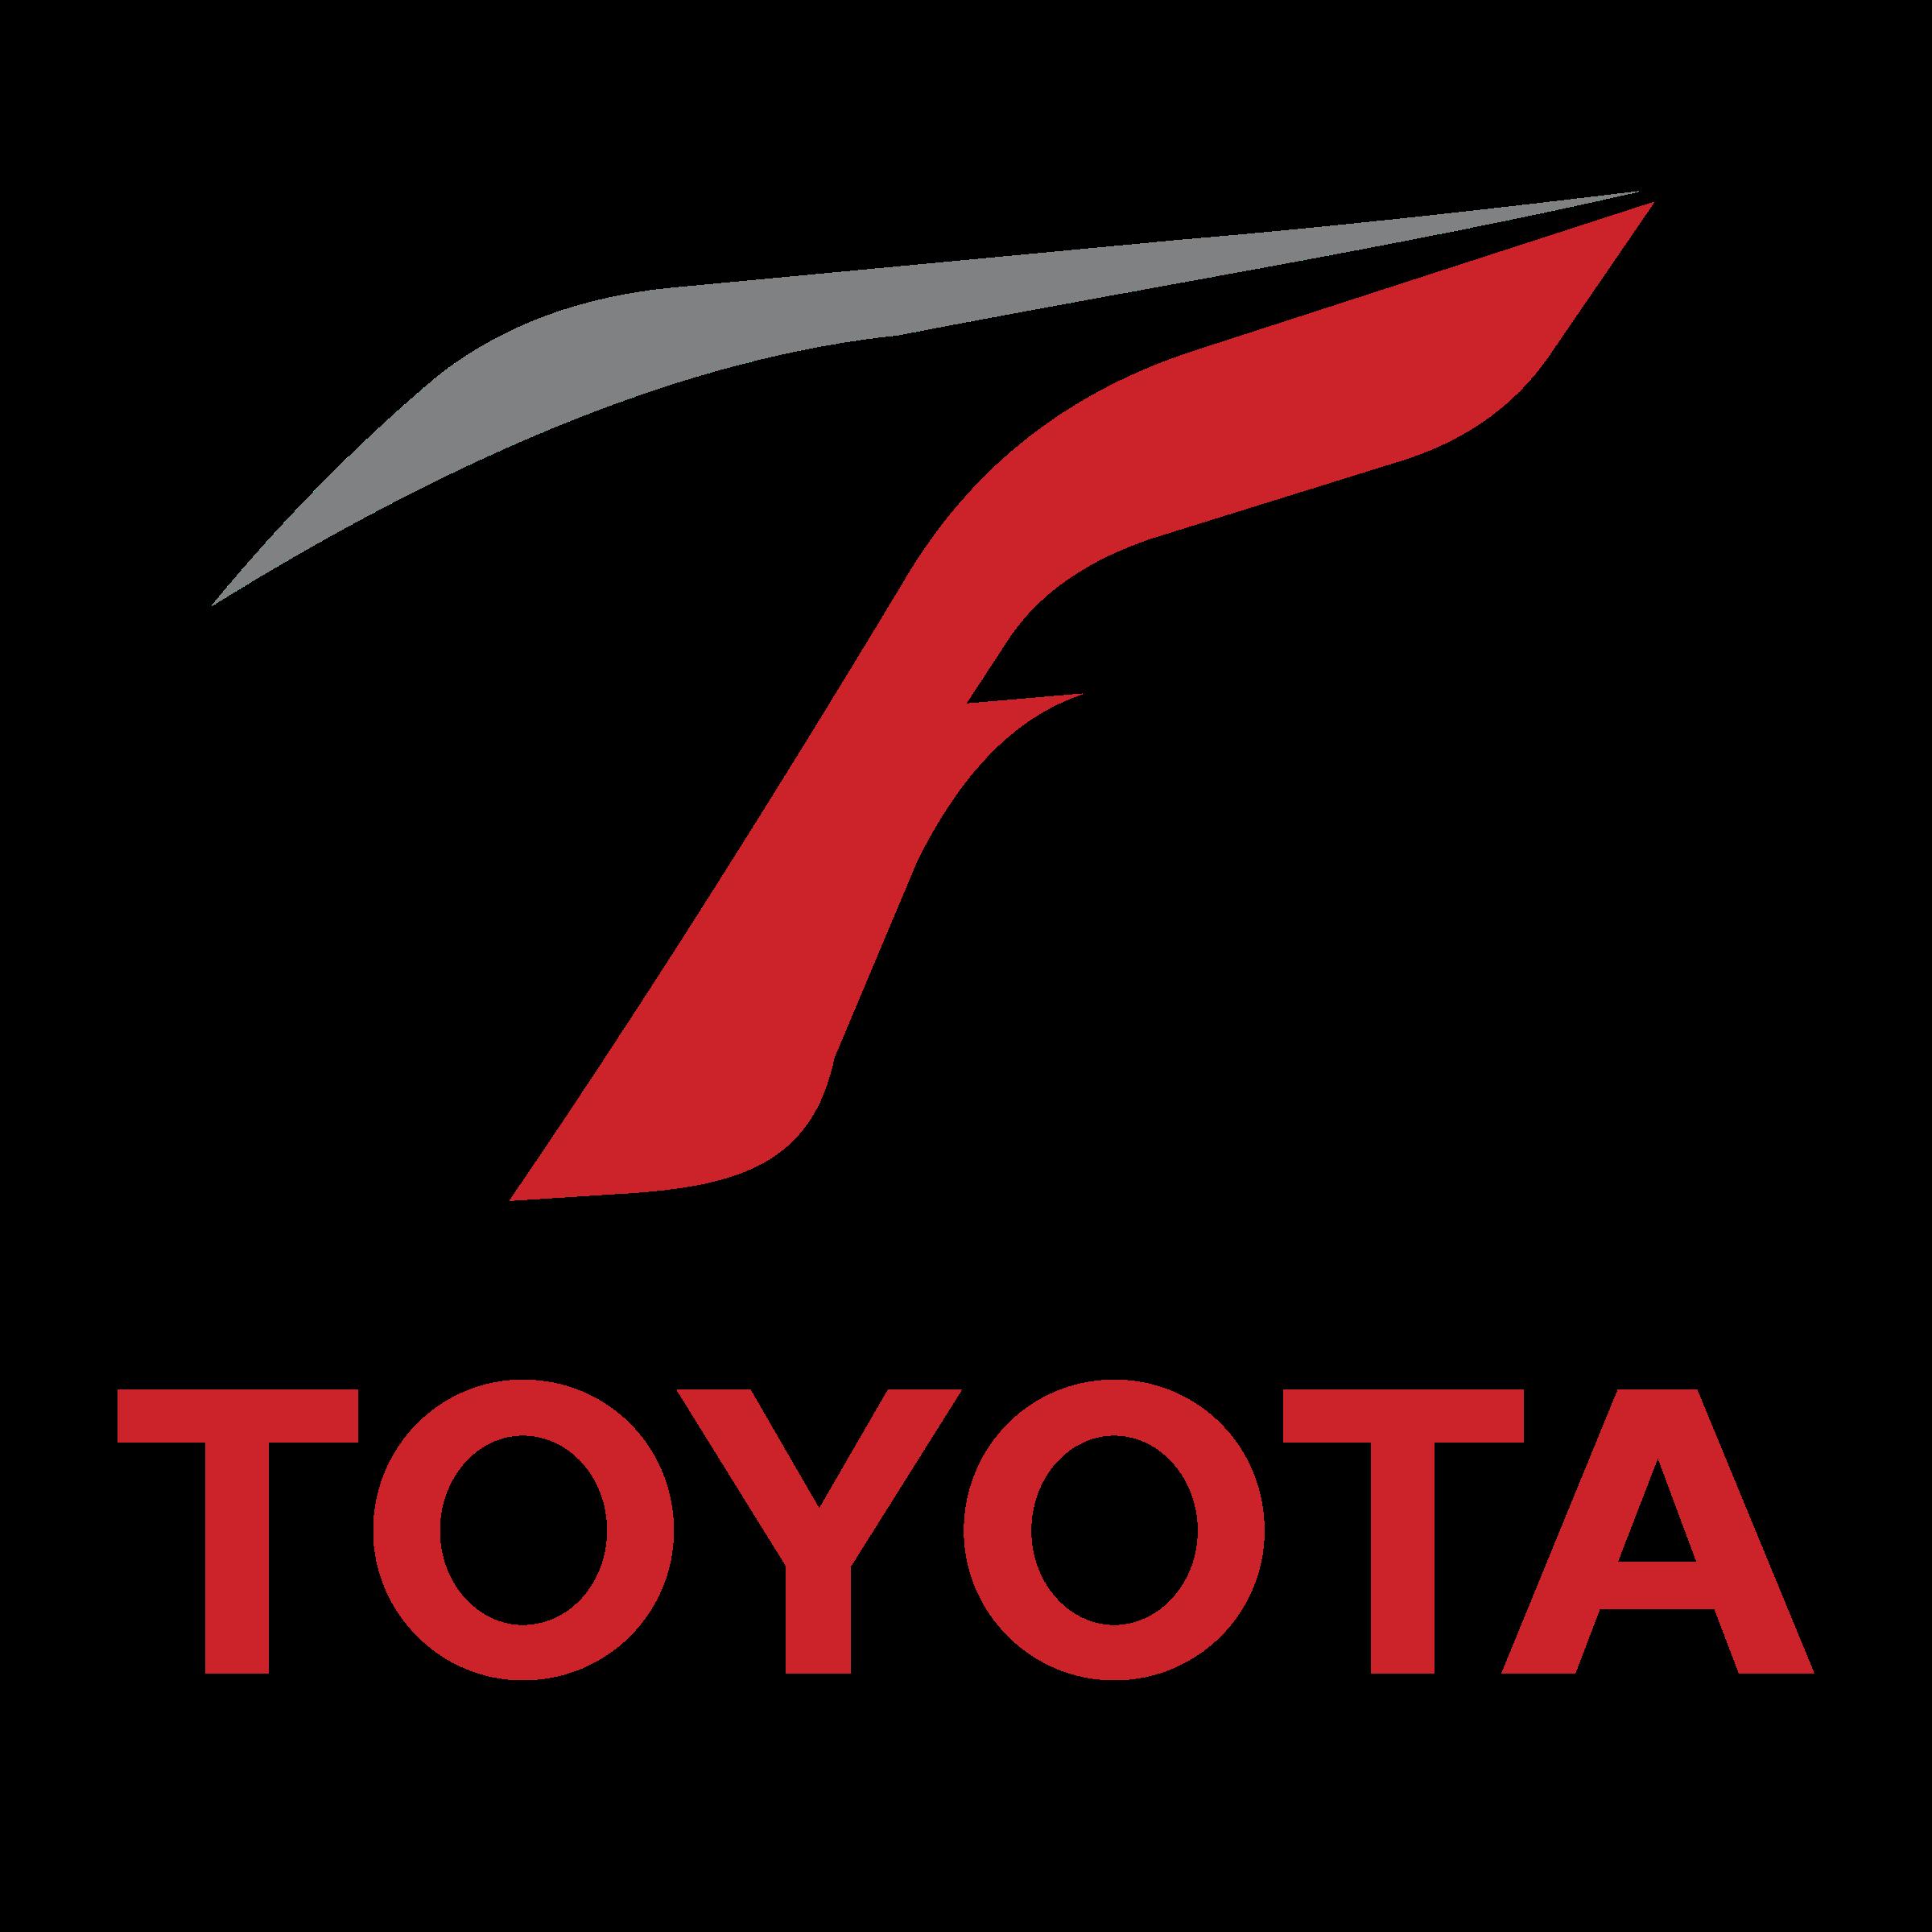 toyota f1 logo png transparent svg vector freebie supply rh freebiesupply com toyota logotype vector toyota vector logo free